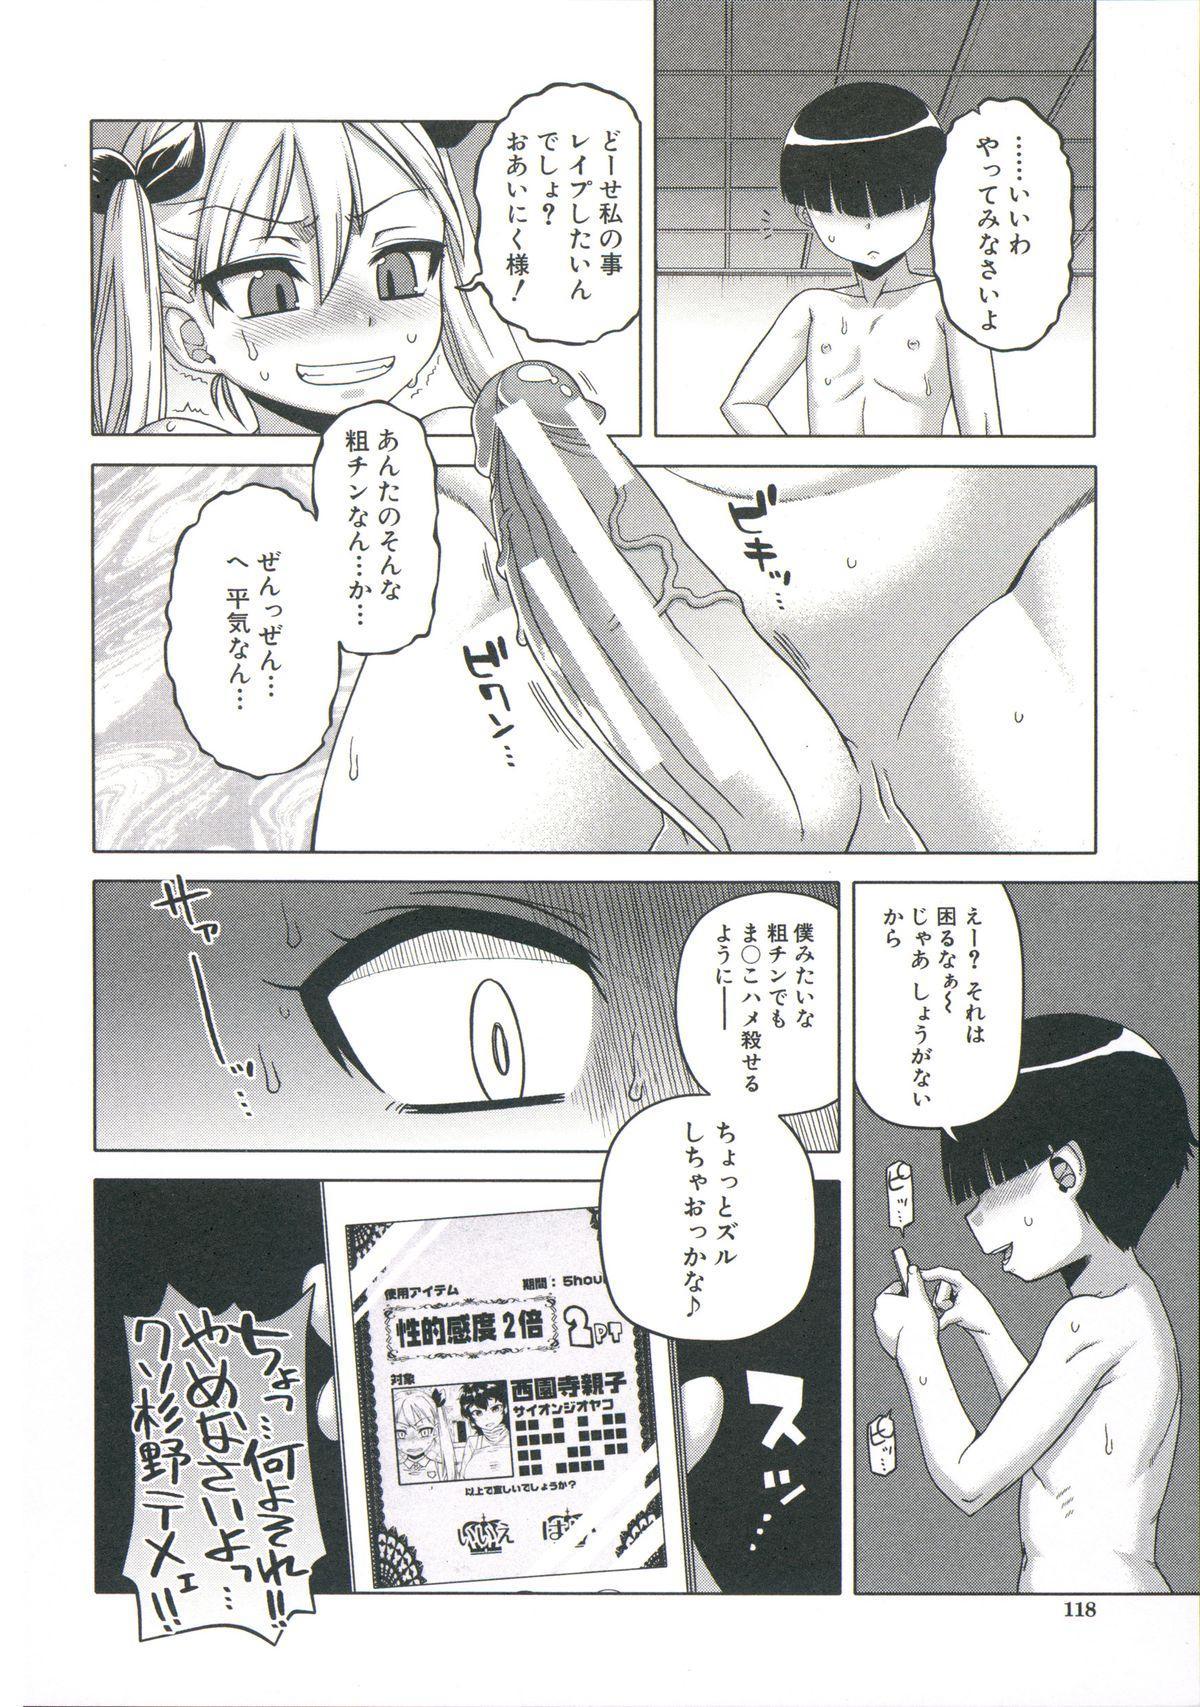 [Takatsu] Ou-sama Appli - King App 120